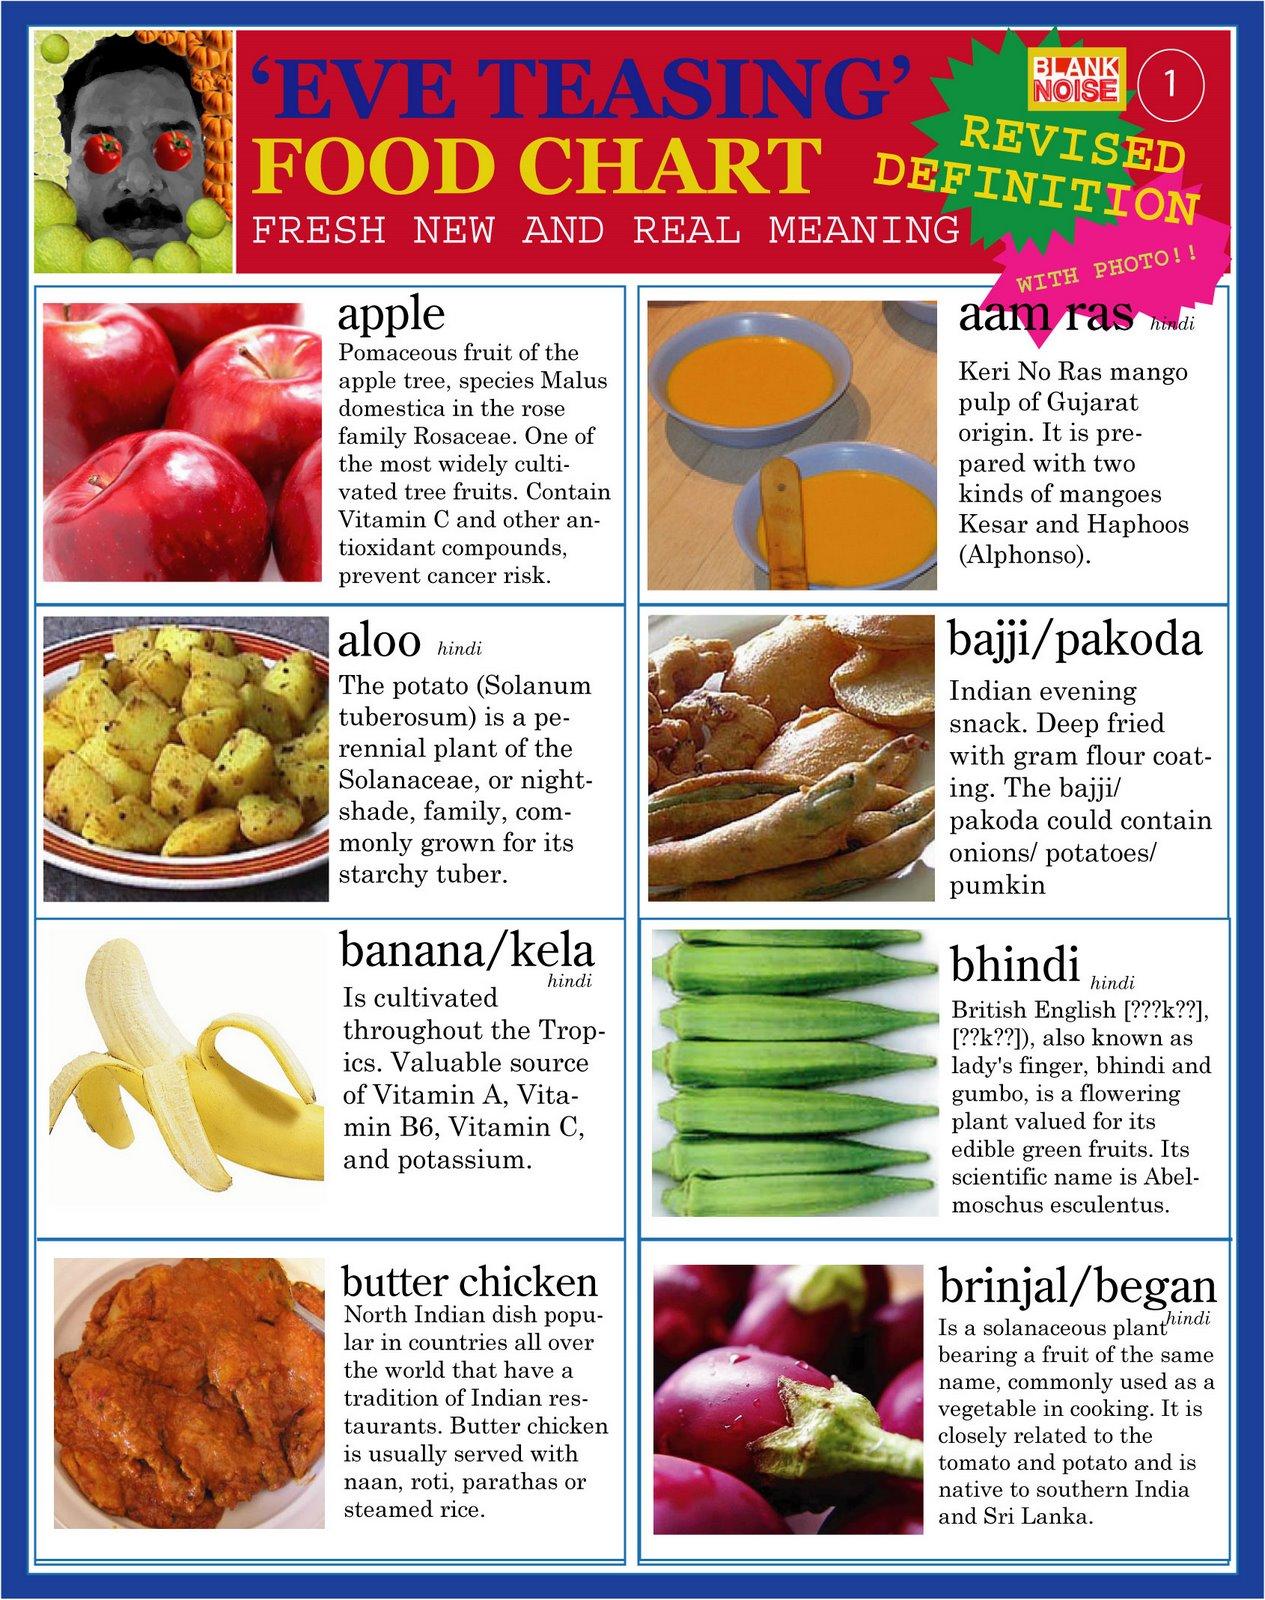 eve-teasing-food-chart1.jpg